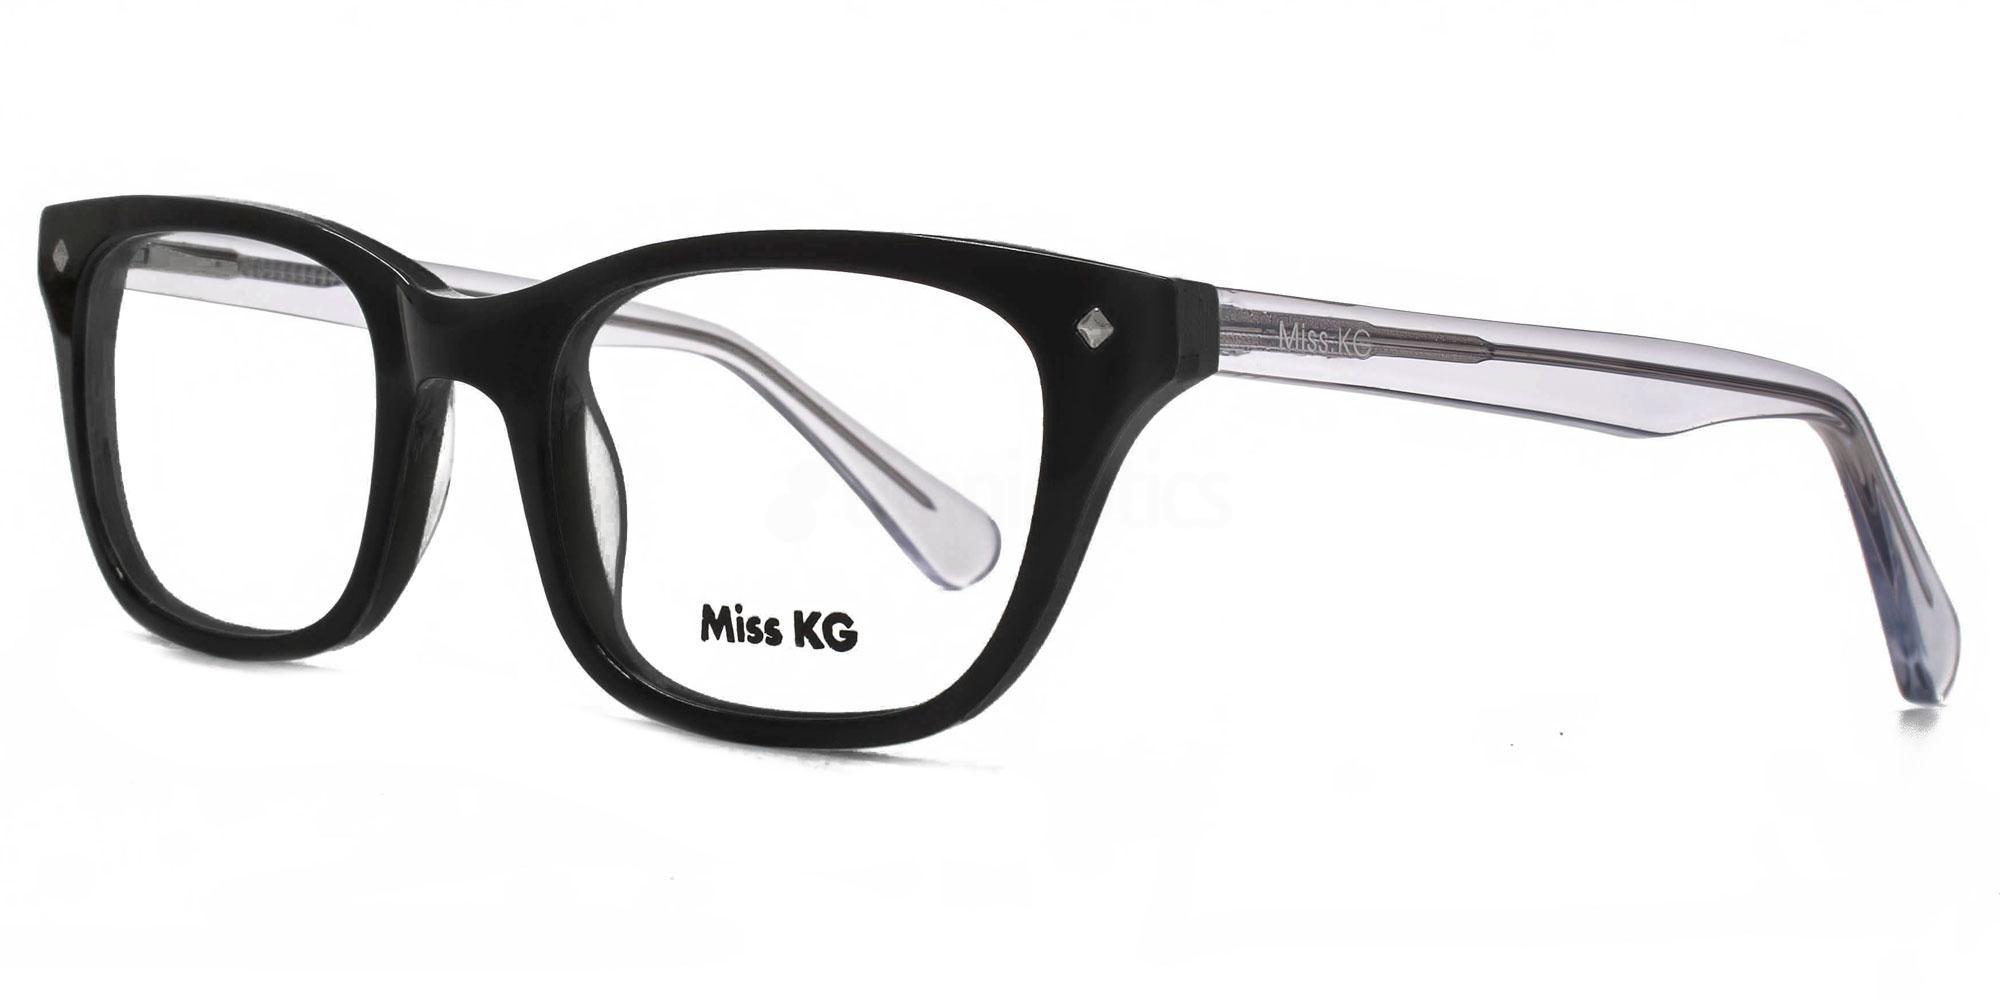 BLK MKGS005 , Miss KG